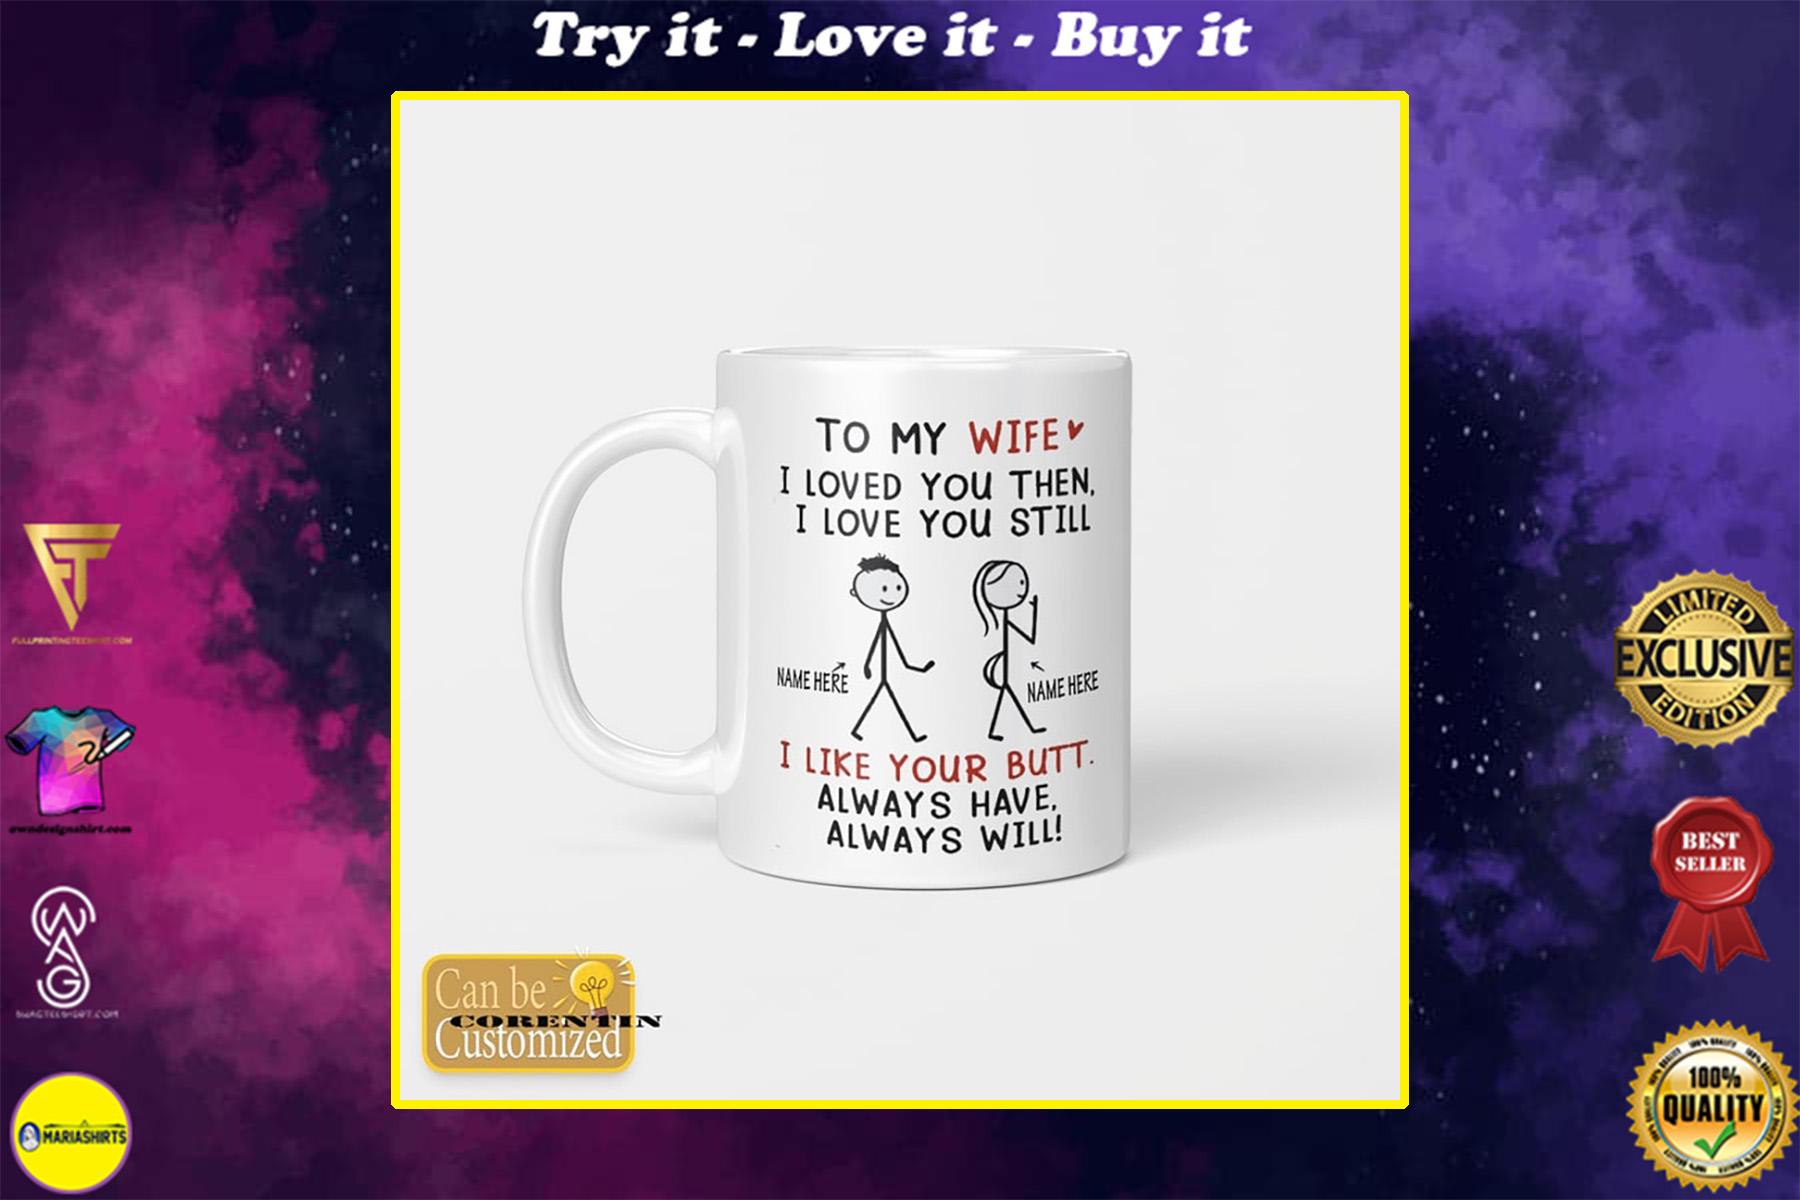 custom name to my wife i loved you then i love you still happy valentine's day mug